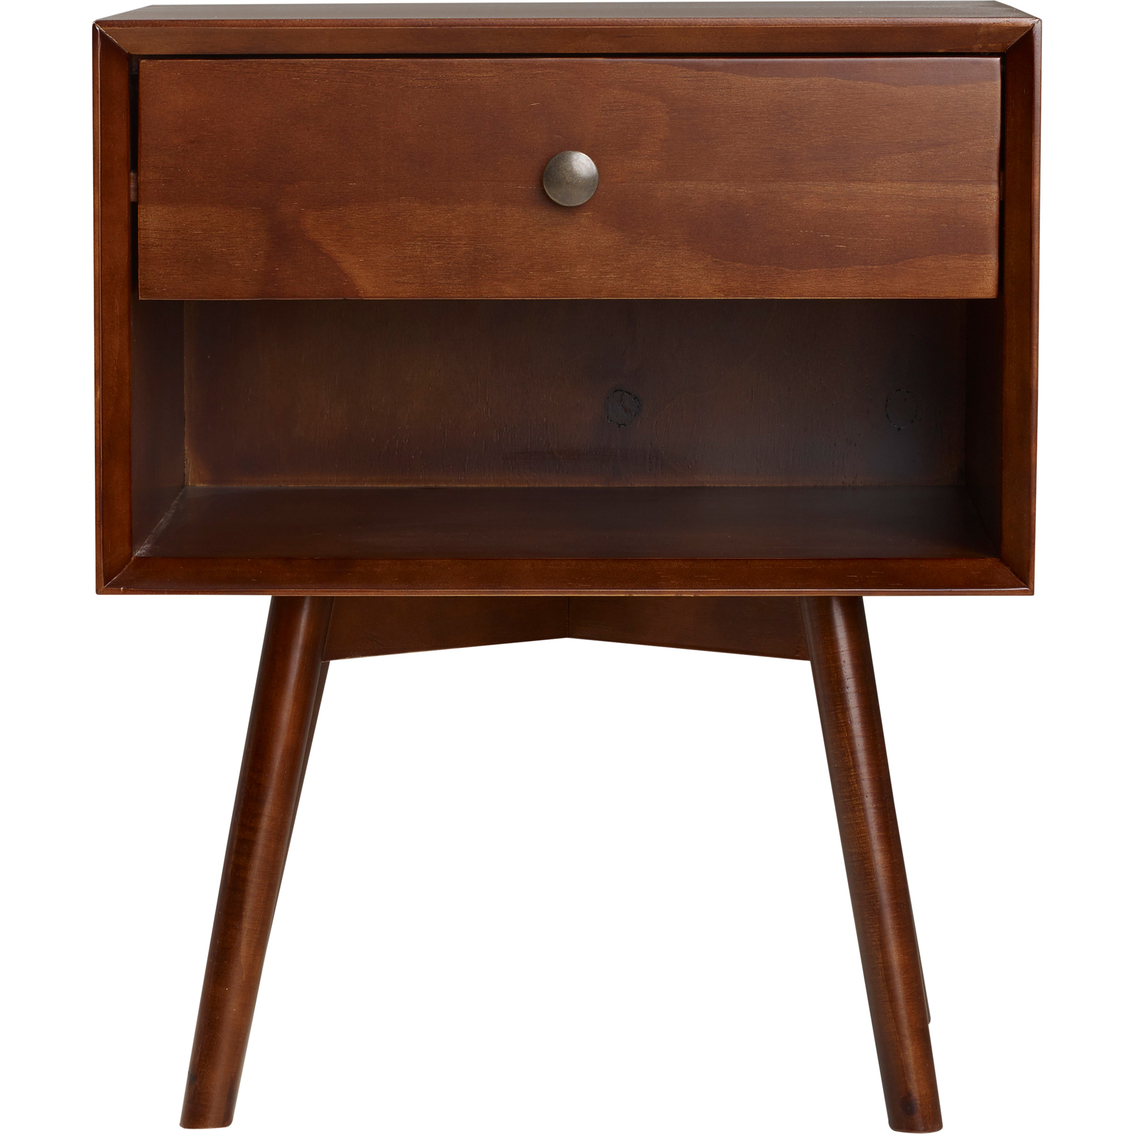 Walker Edison Mid Century One Drawer Solid Wood Nightstand Nightstands Furniture Appliances Shop The Exchange